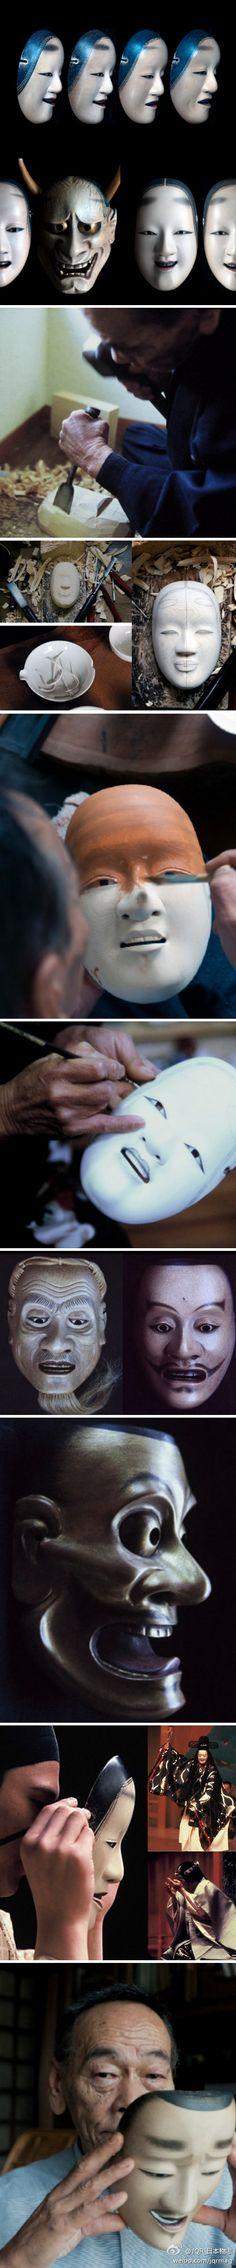 Noh mask artist, Koichi TAKATSU 能面师髙津紘一(1941-2011)Japan